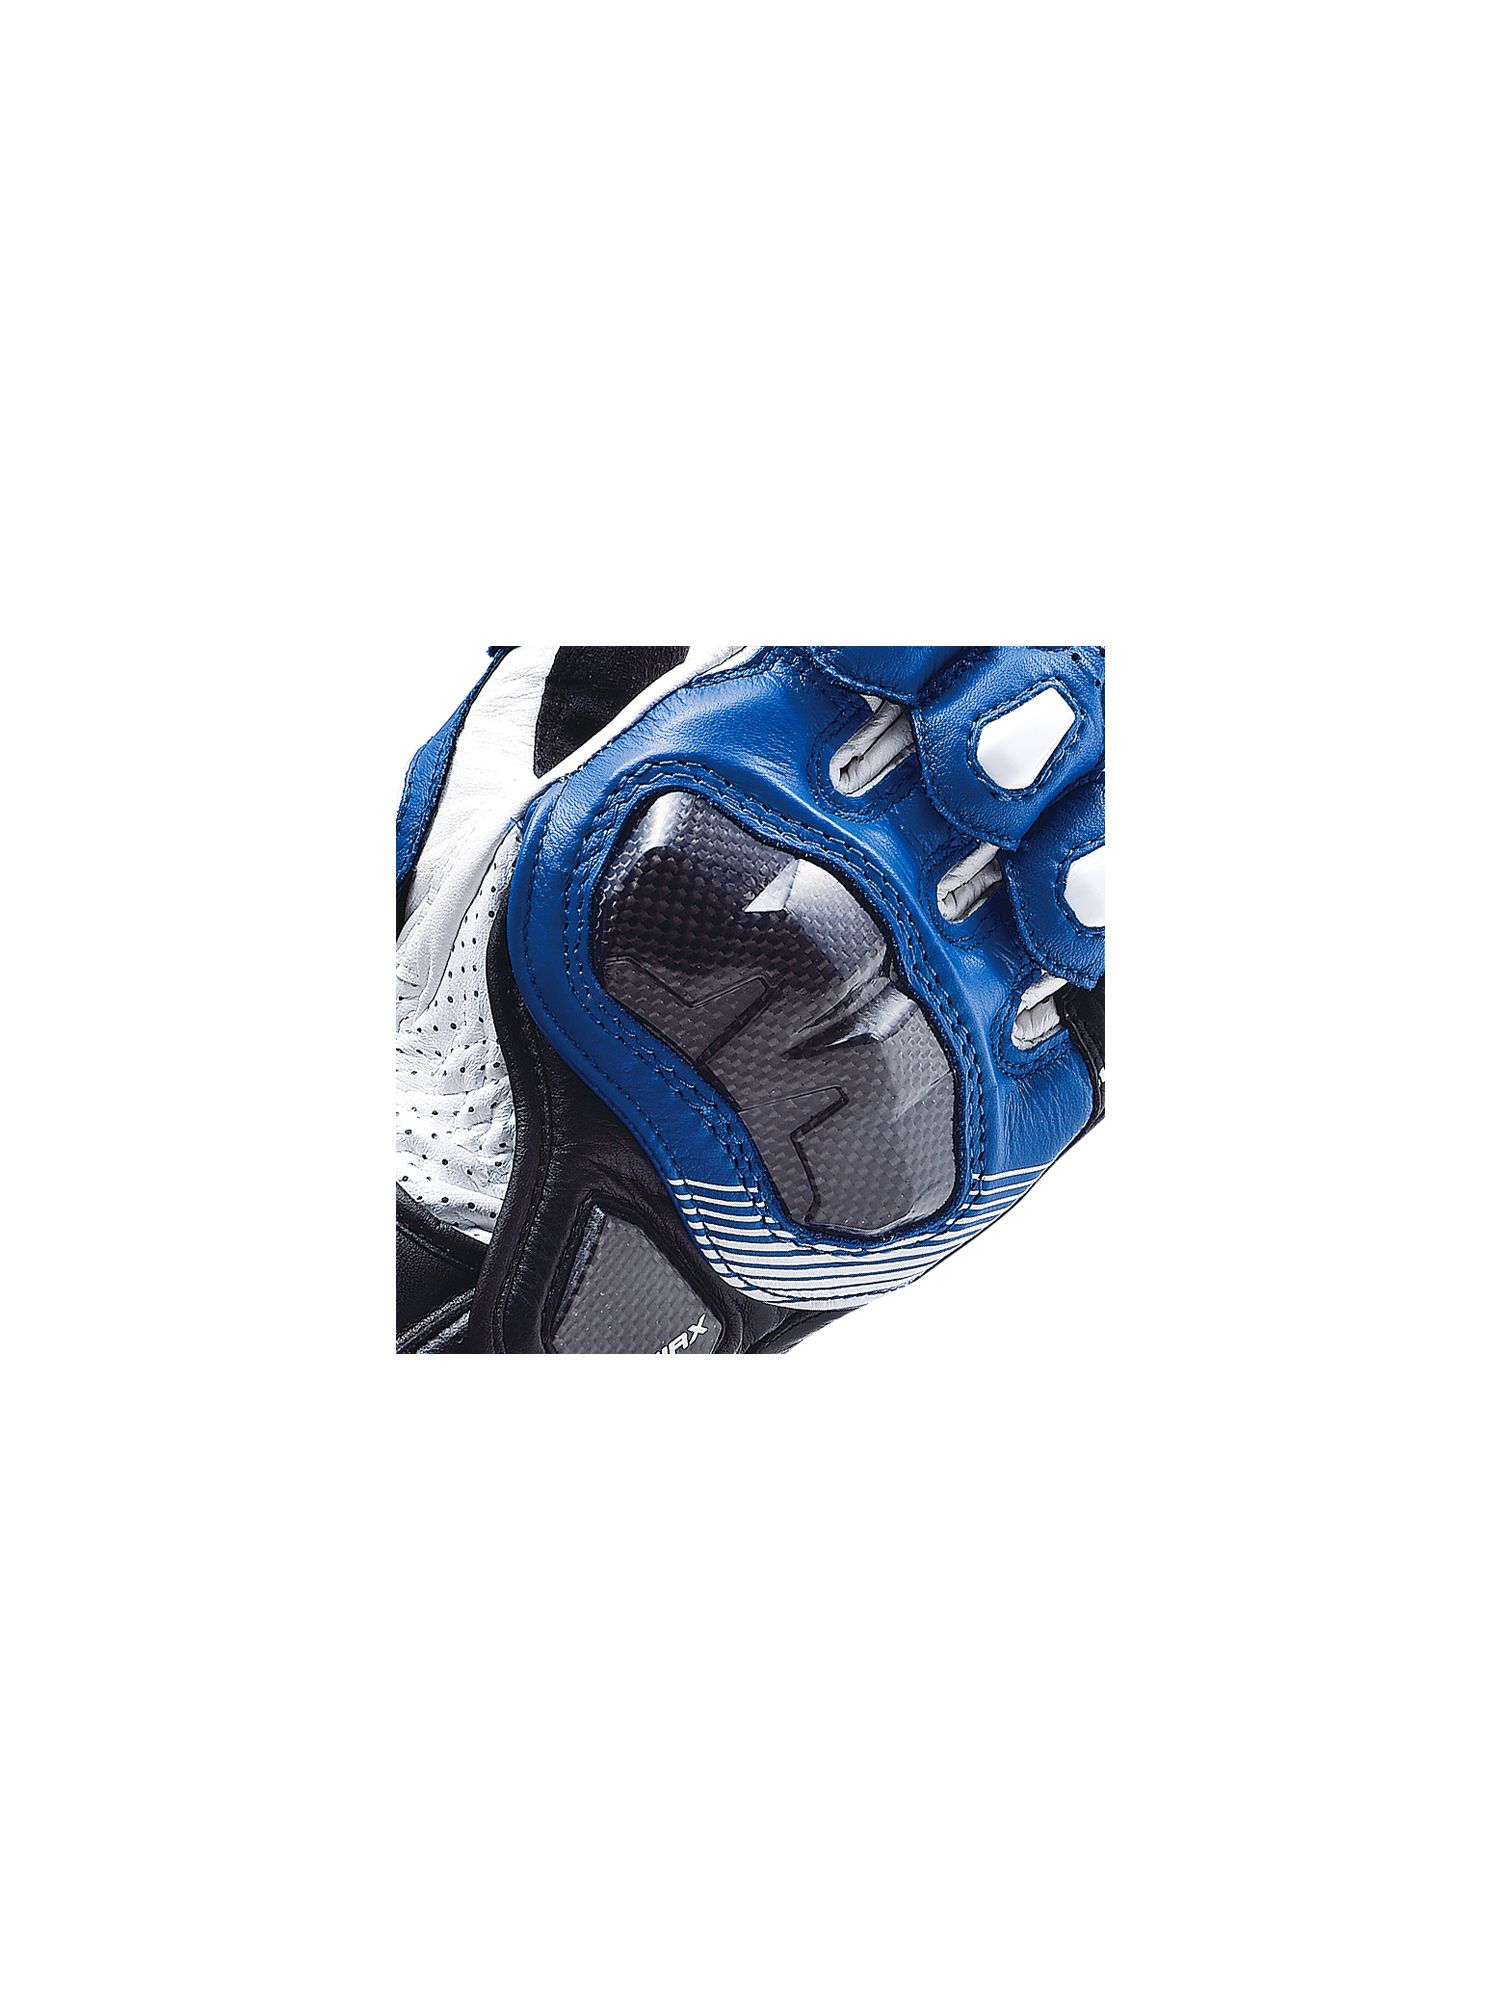 NXT052 | GP-WRX RACING GLOVE[5colors]